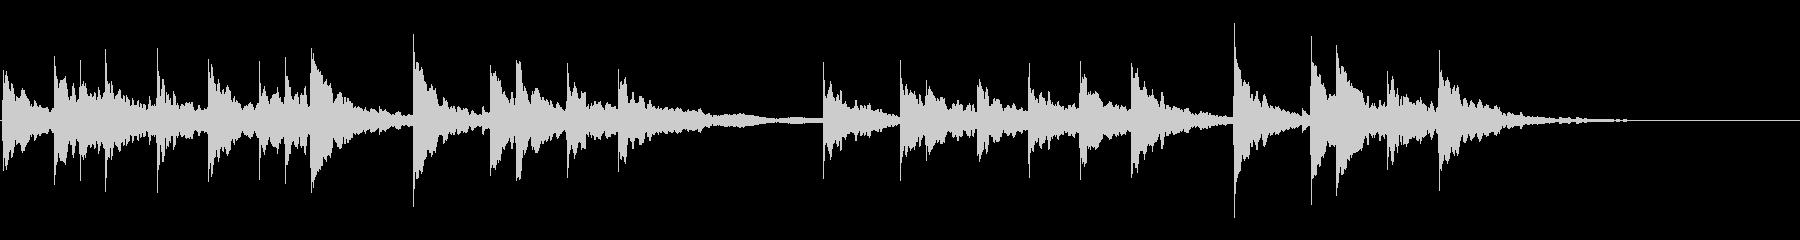 KANT電街の夕刻に流れるメロディの未再生の波形